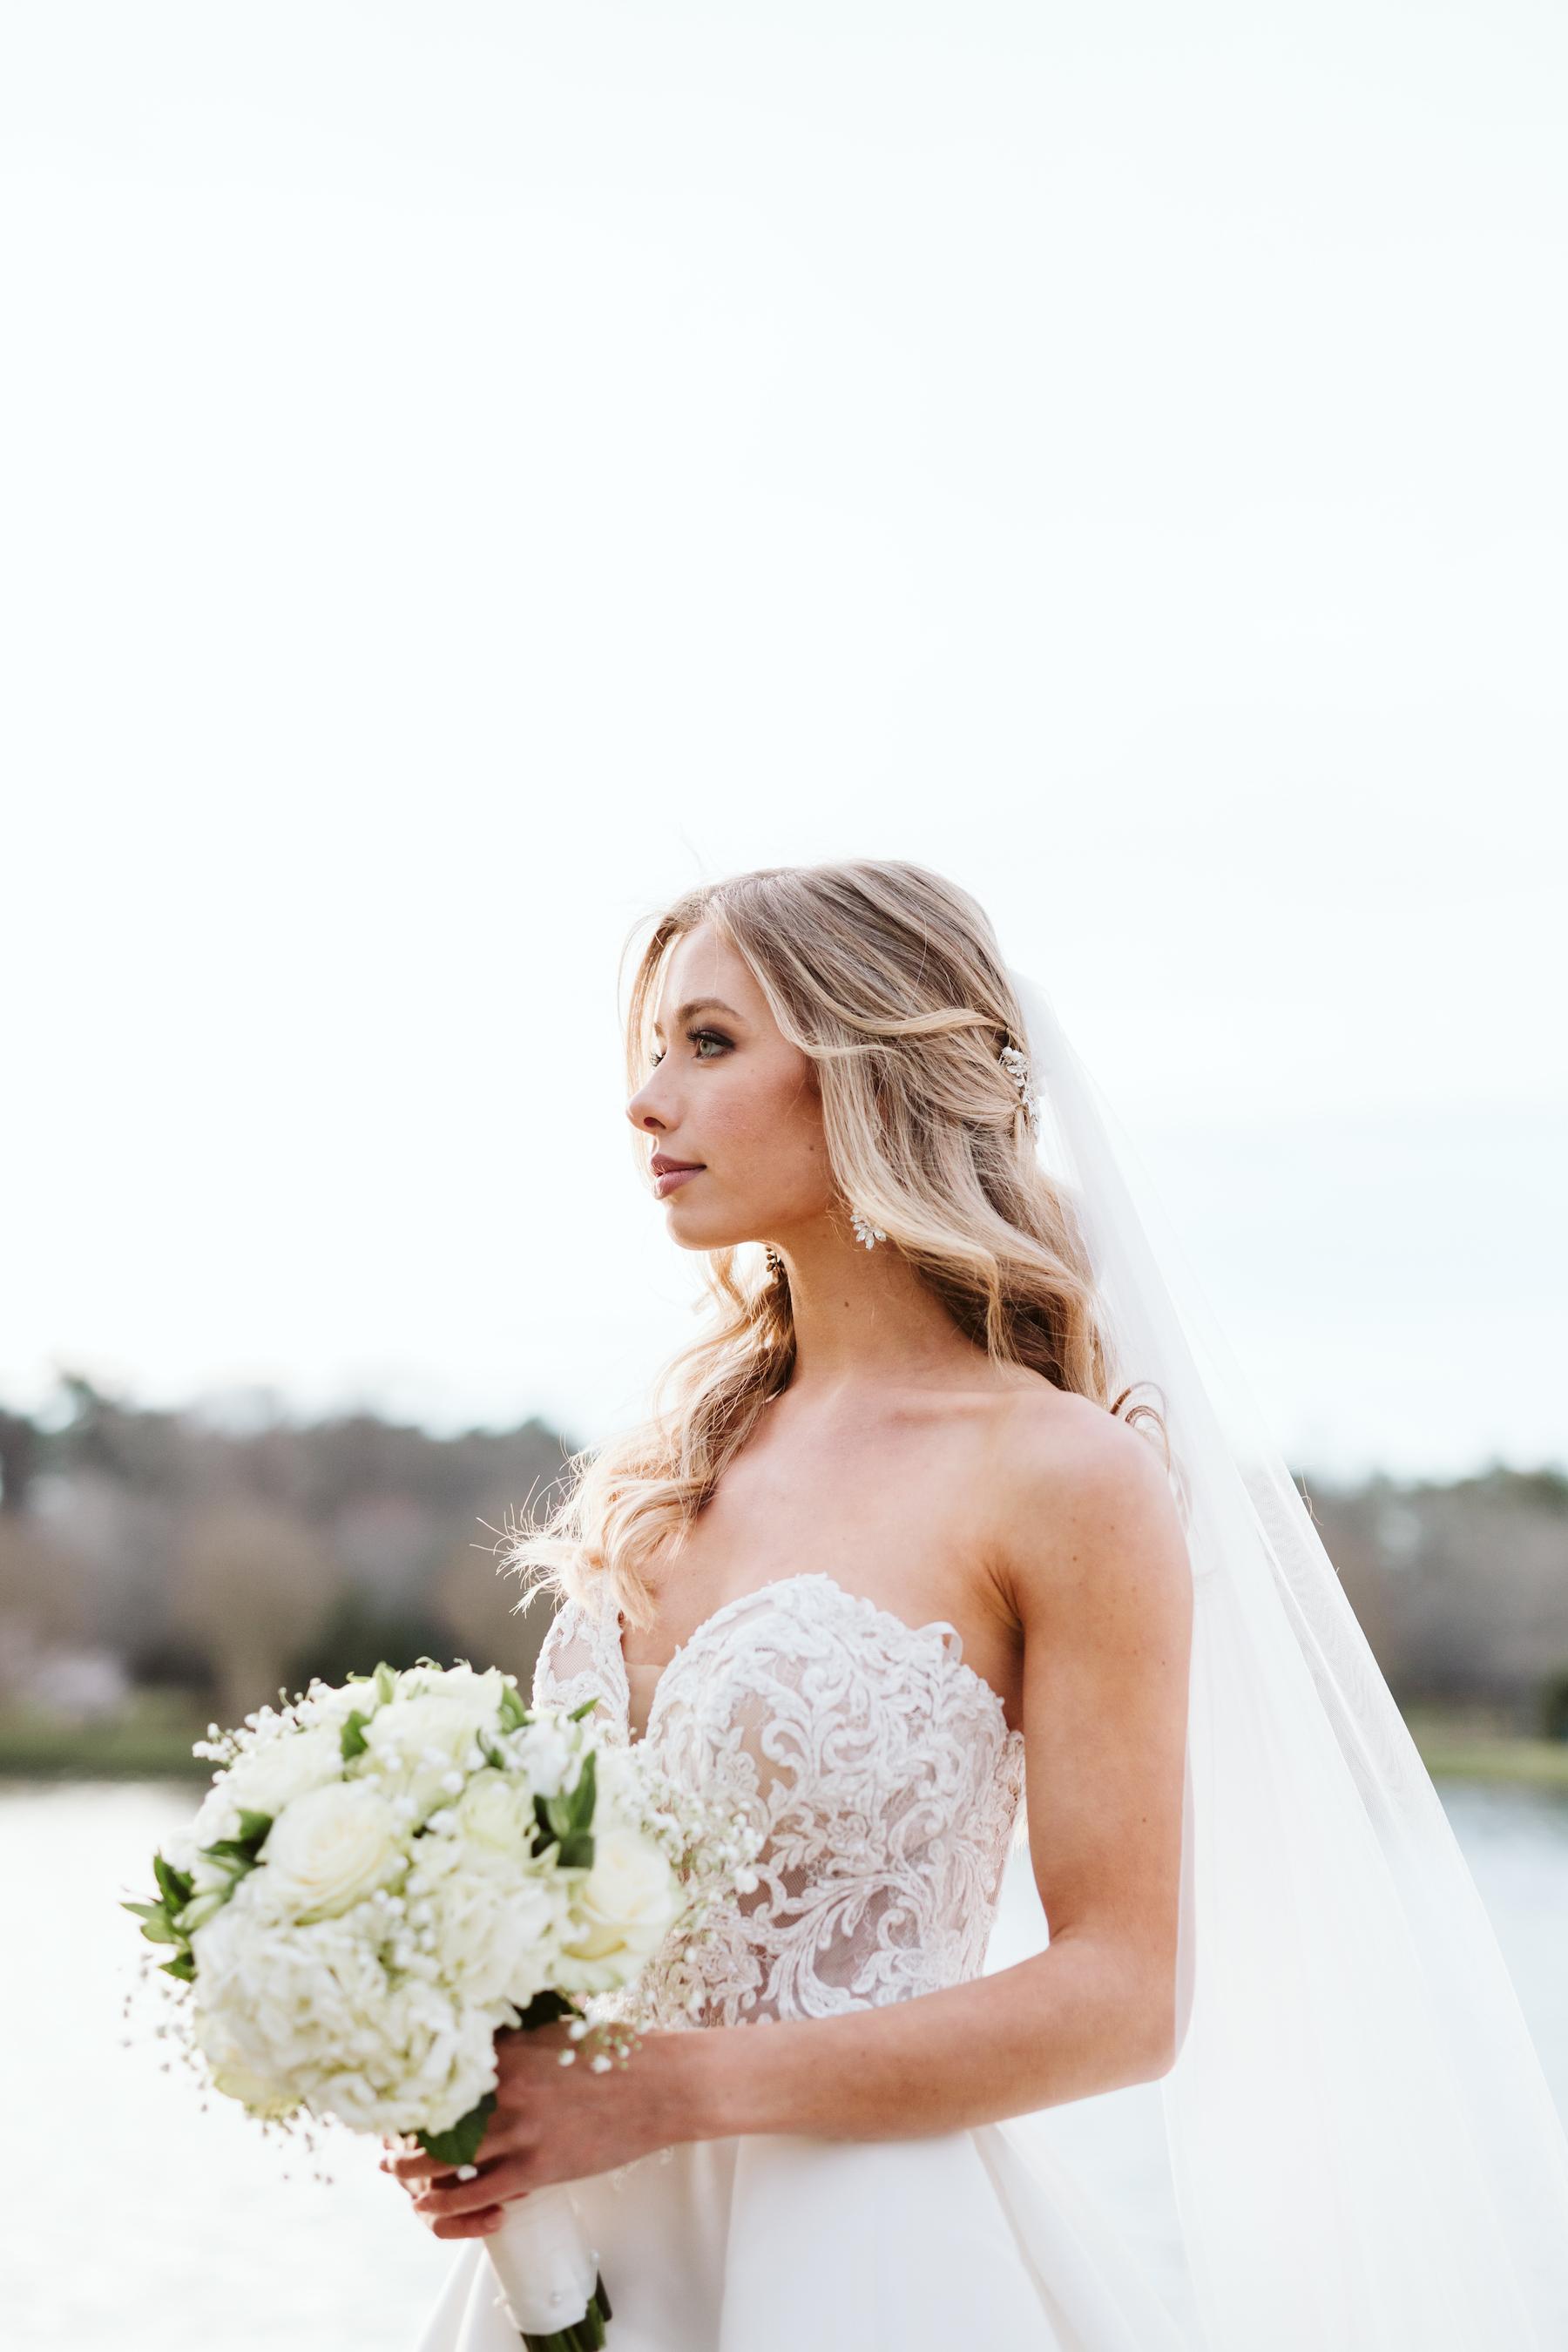 furman-university-bridals-paige-215.JPG